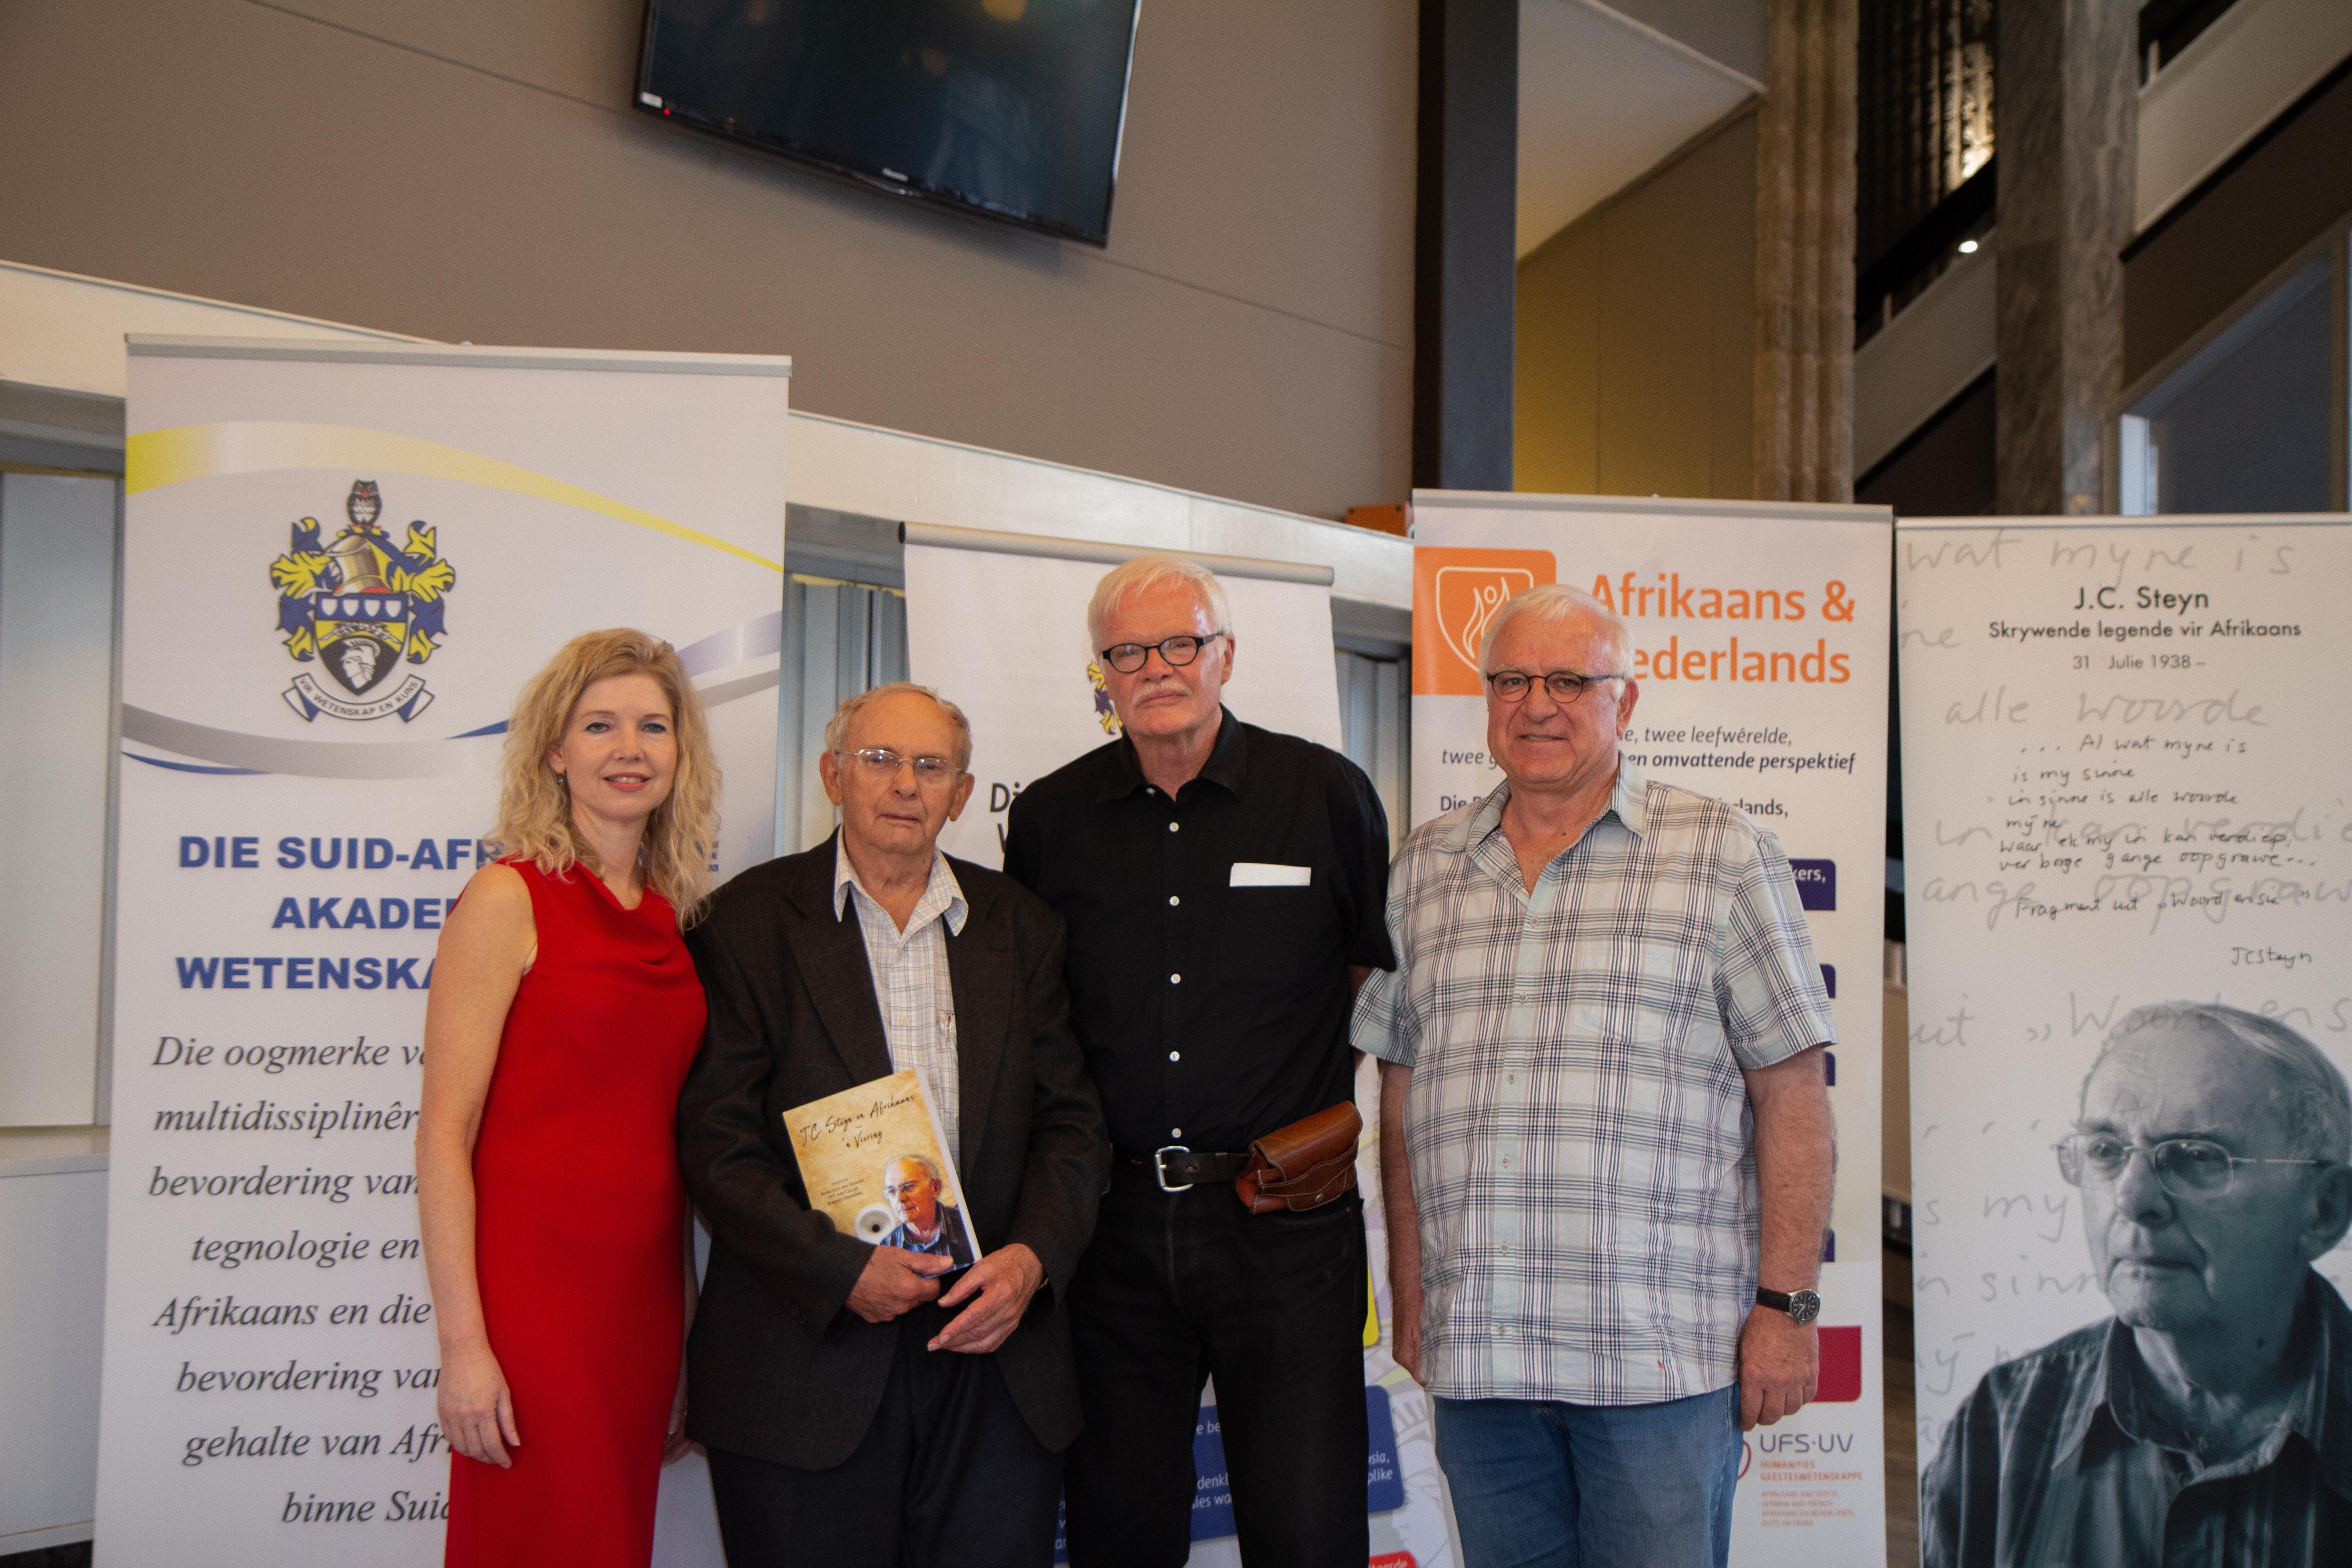 Prof Angelique van Niekerk, Prof Jaap Steyn, Prof Hennie van Coller and Prof Bernard Odendaal